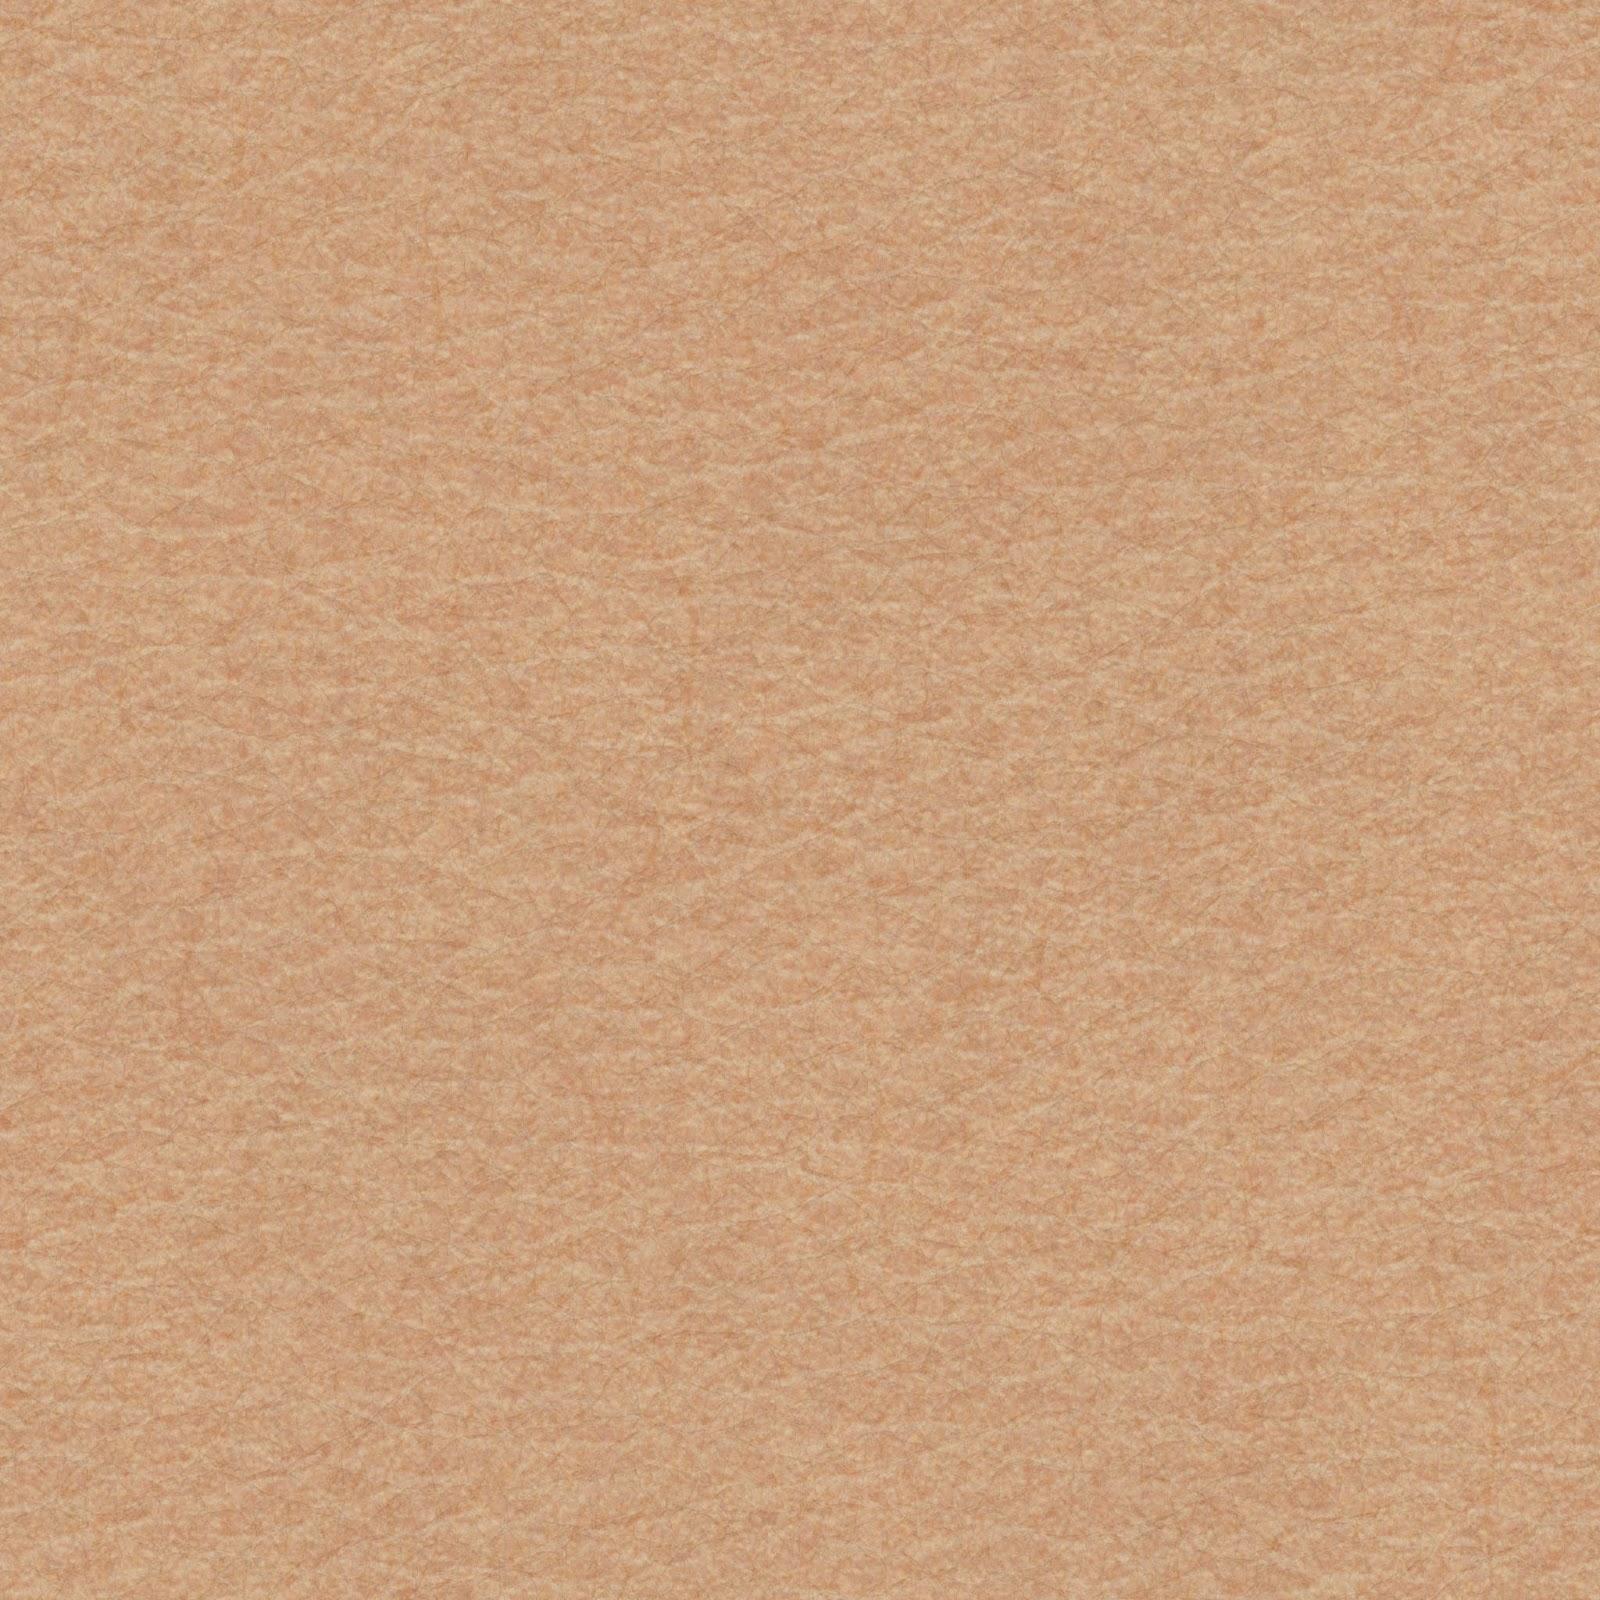 High Resolution Seamless Textures Tileable Human Skin